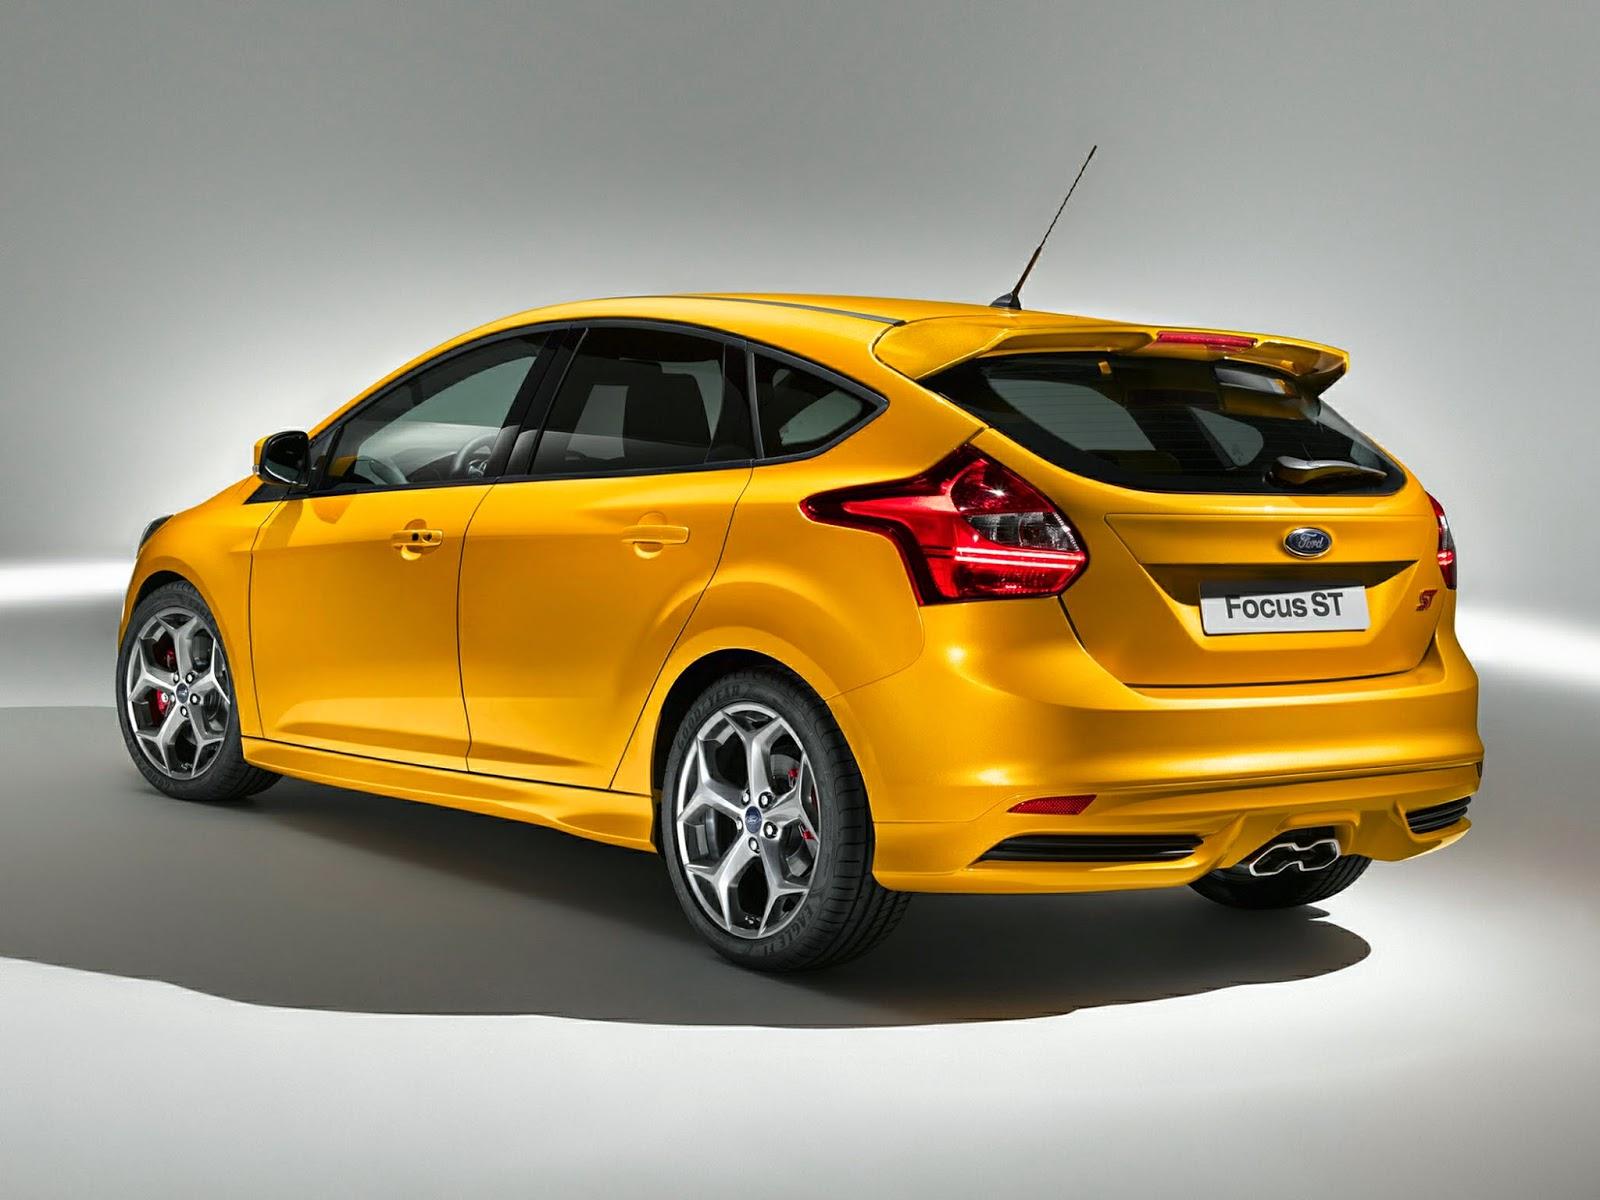 Harga Ford Fiesta  Bp Blogspot Com Ucdtxniv Vsyrwnqpsi